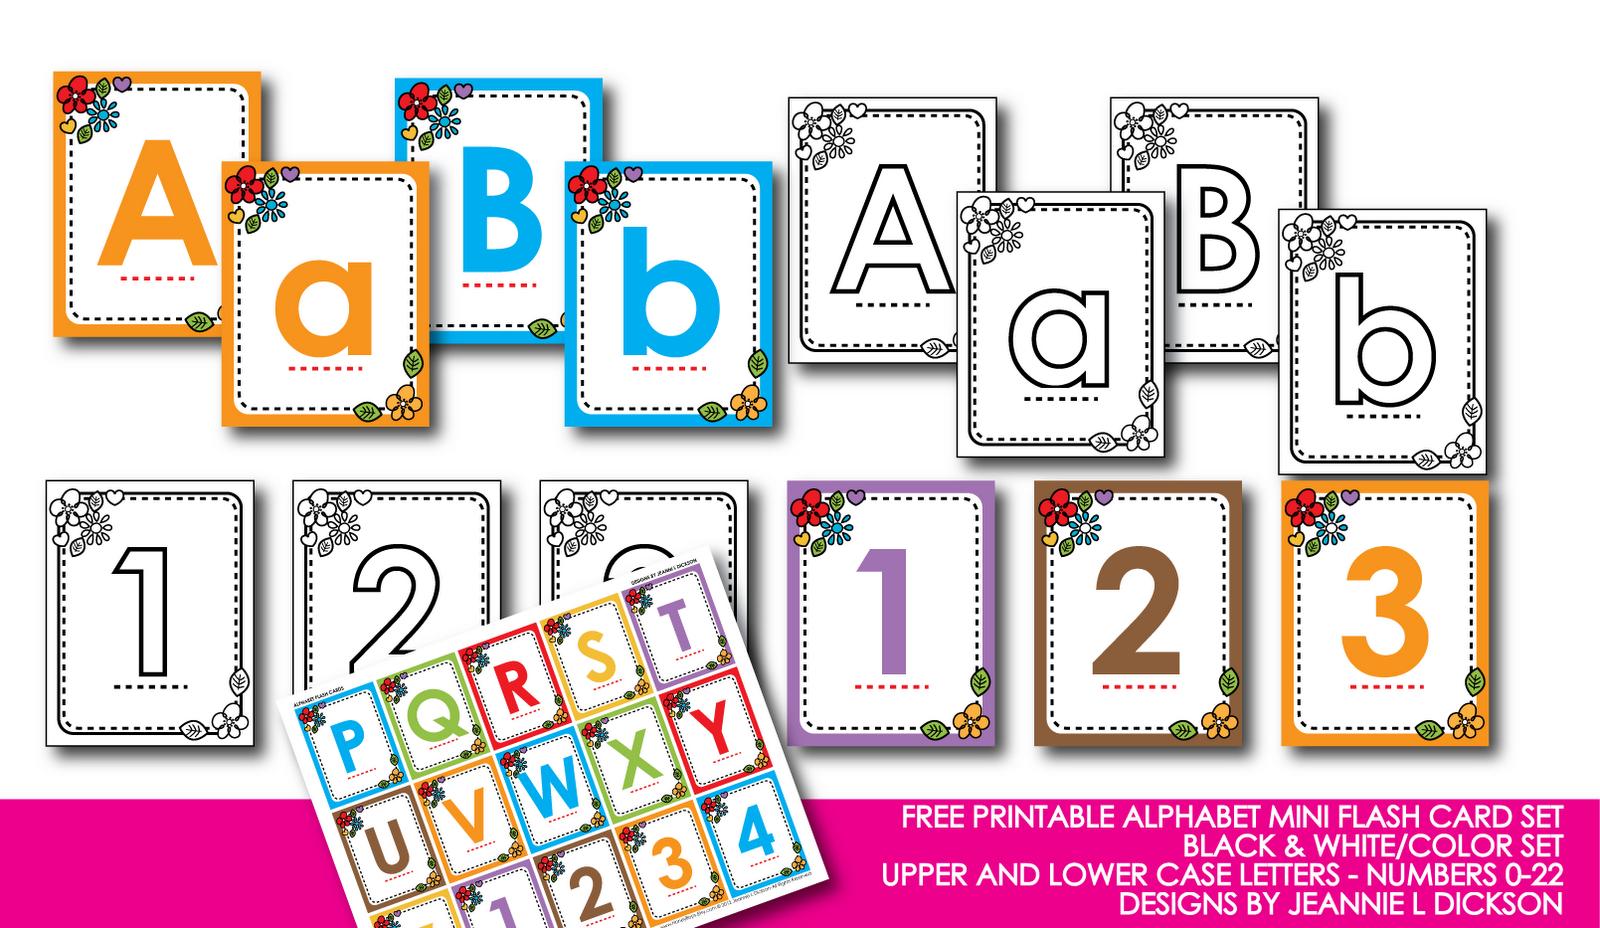 Kindergarten Alphabet Cards | Free Printable Alphabet Mini Flash - Free Printable Colored Letters Of The Alphabet